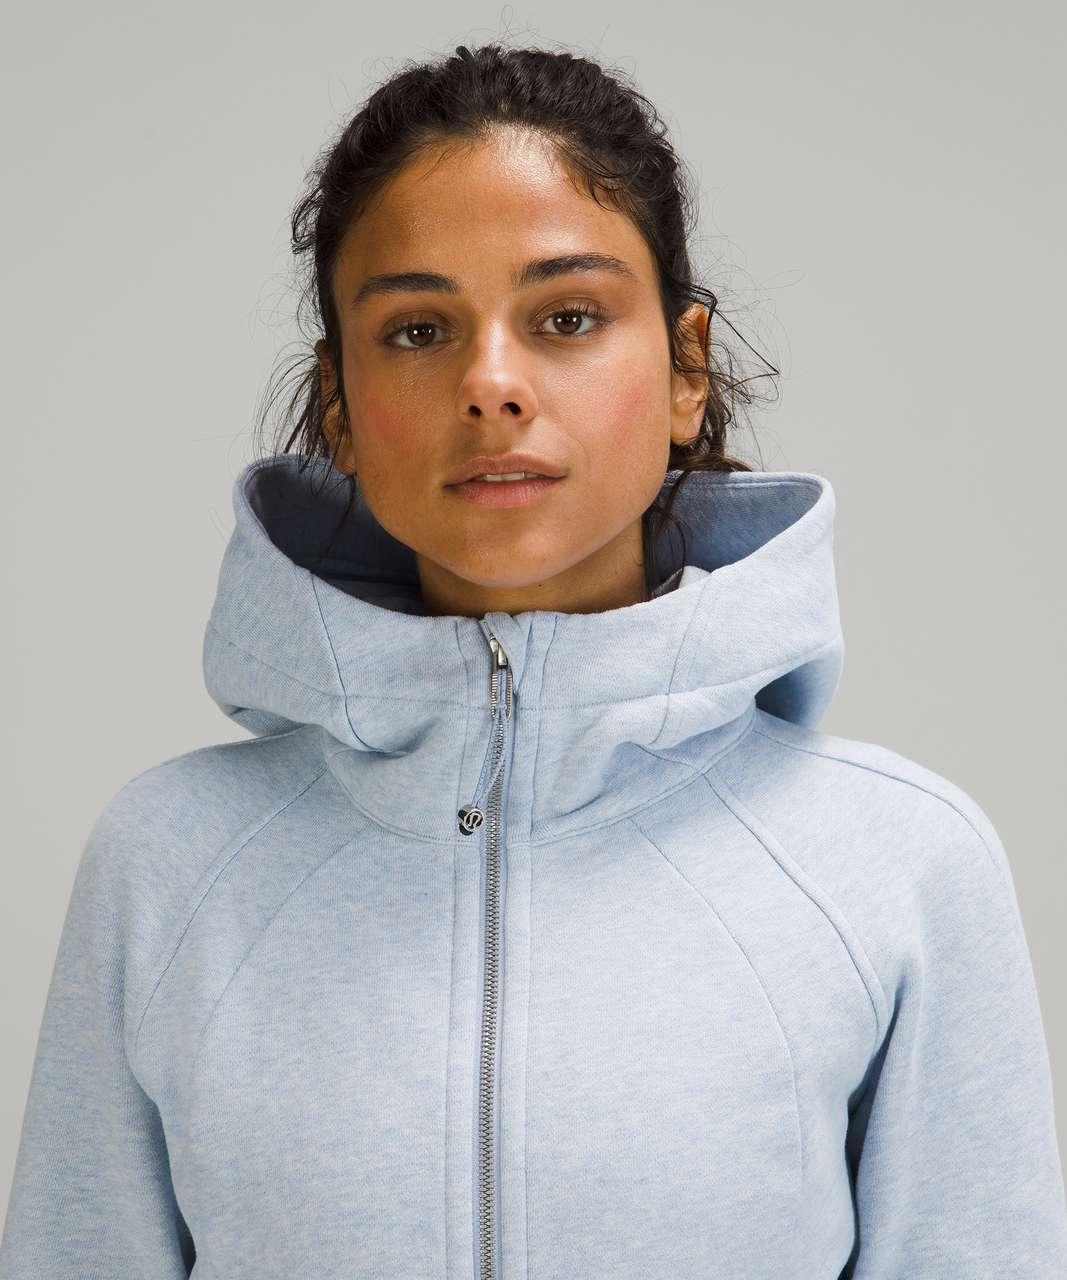 Lululemon Scuba Hoodie *Light Cotton Fleece - Heathered Blue Linen